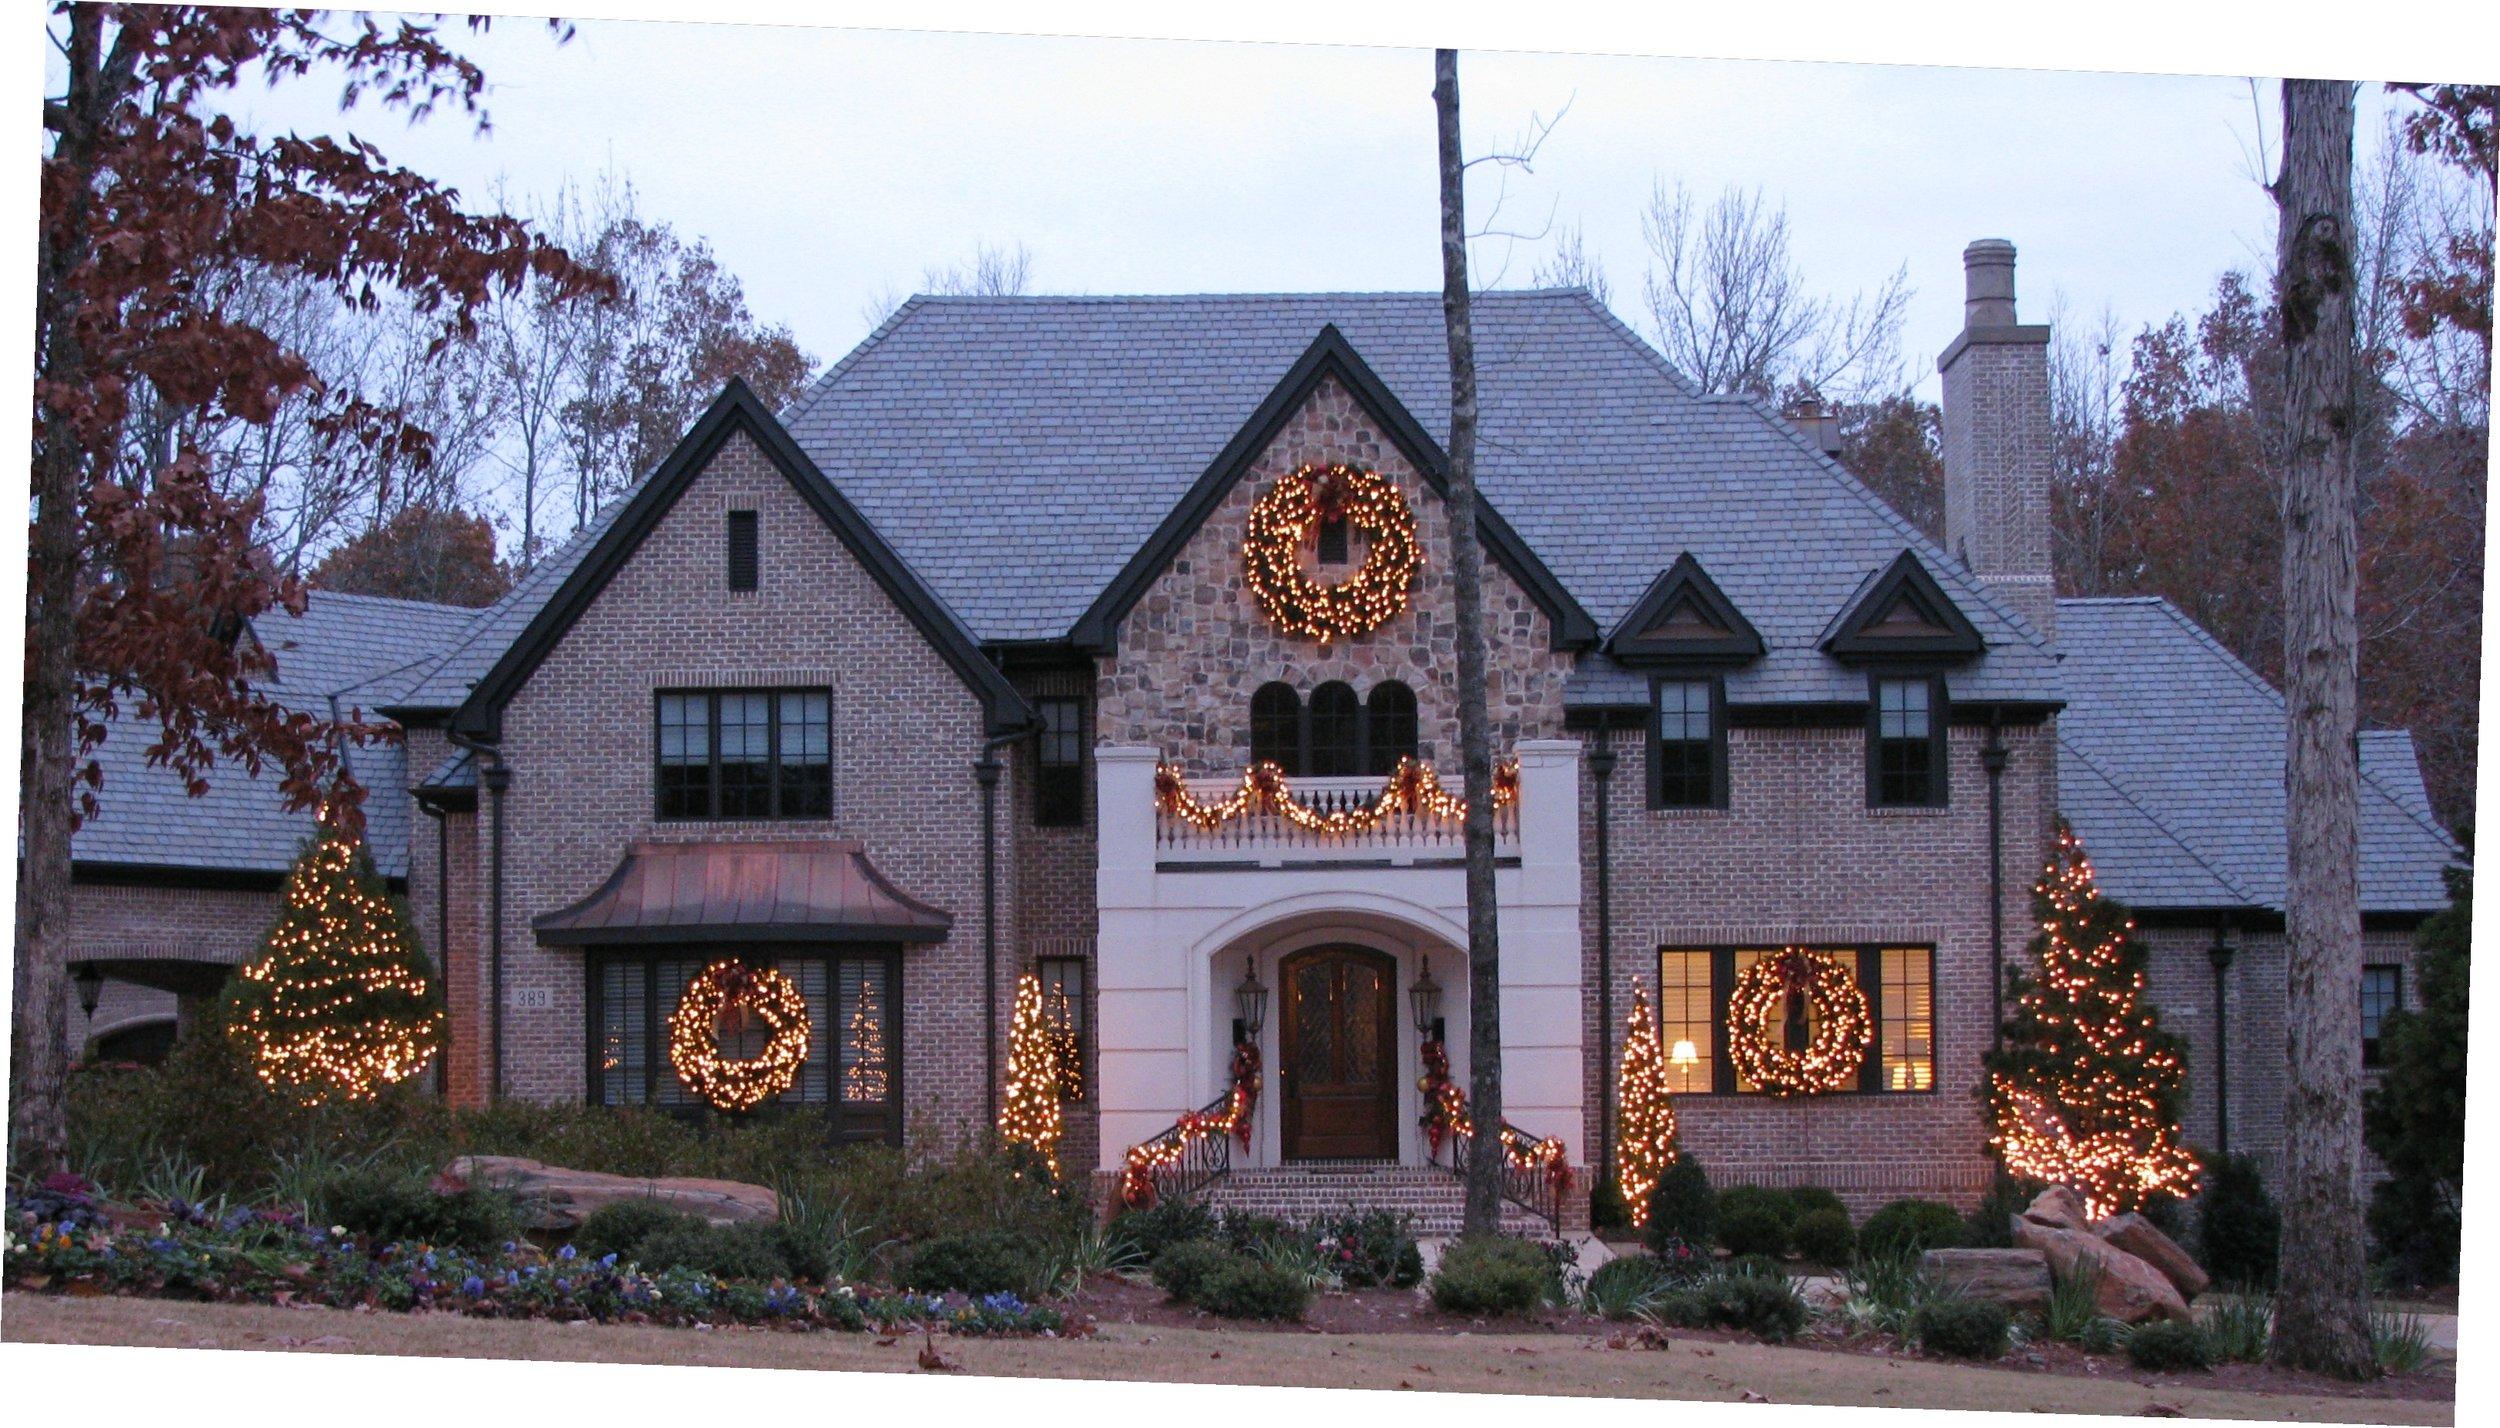 glitter and glow chrismas decor residential exterior (8).JPG